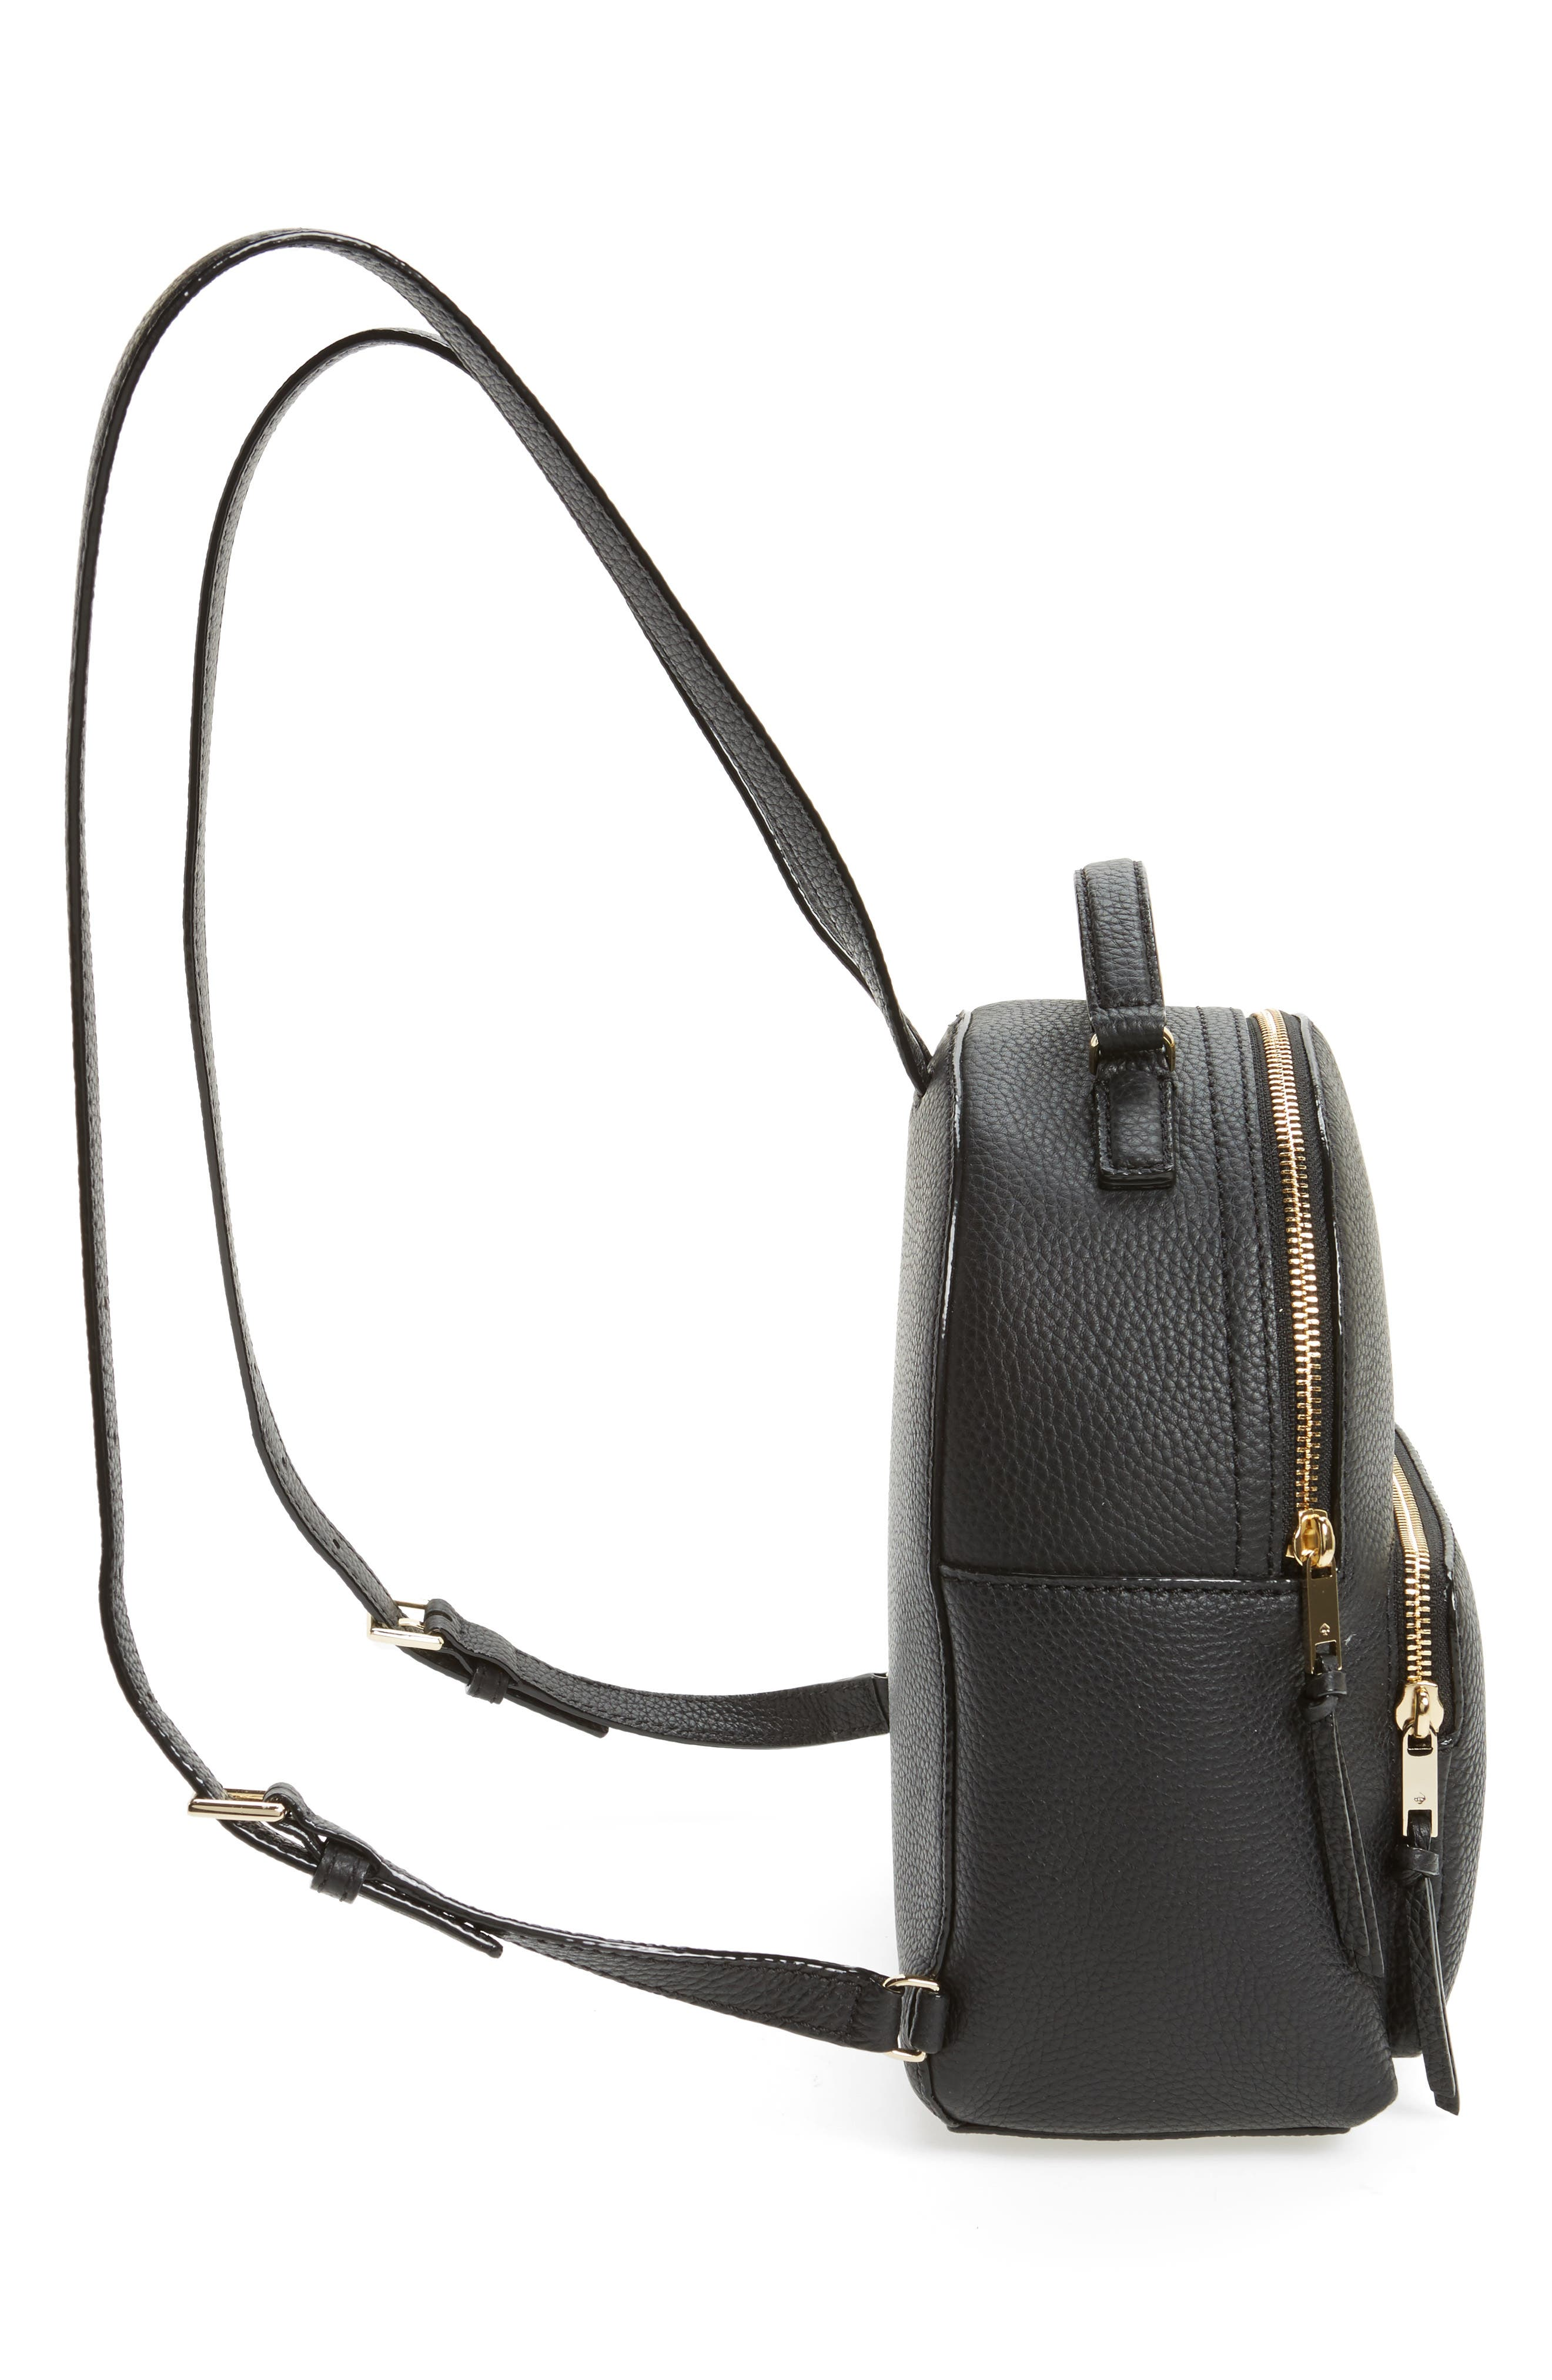 KATE SPADE NEW YORK,                             jackson street - keleigh leather backpack,                             Alternate thumbnail 5, color,                             BLACK